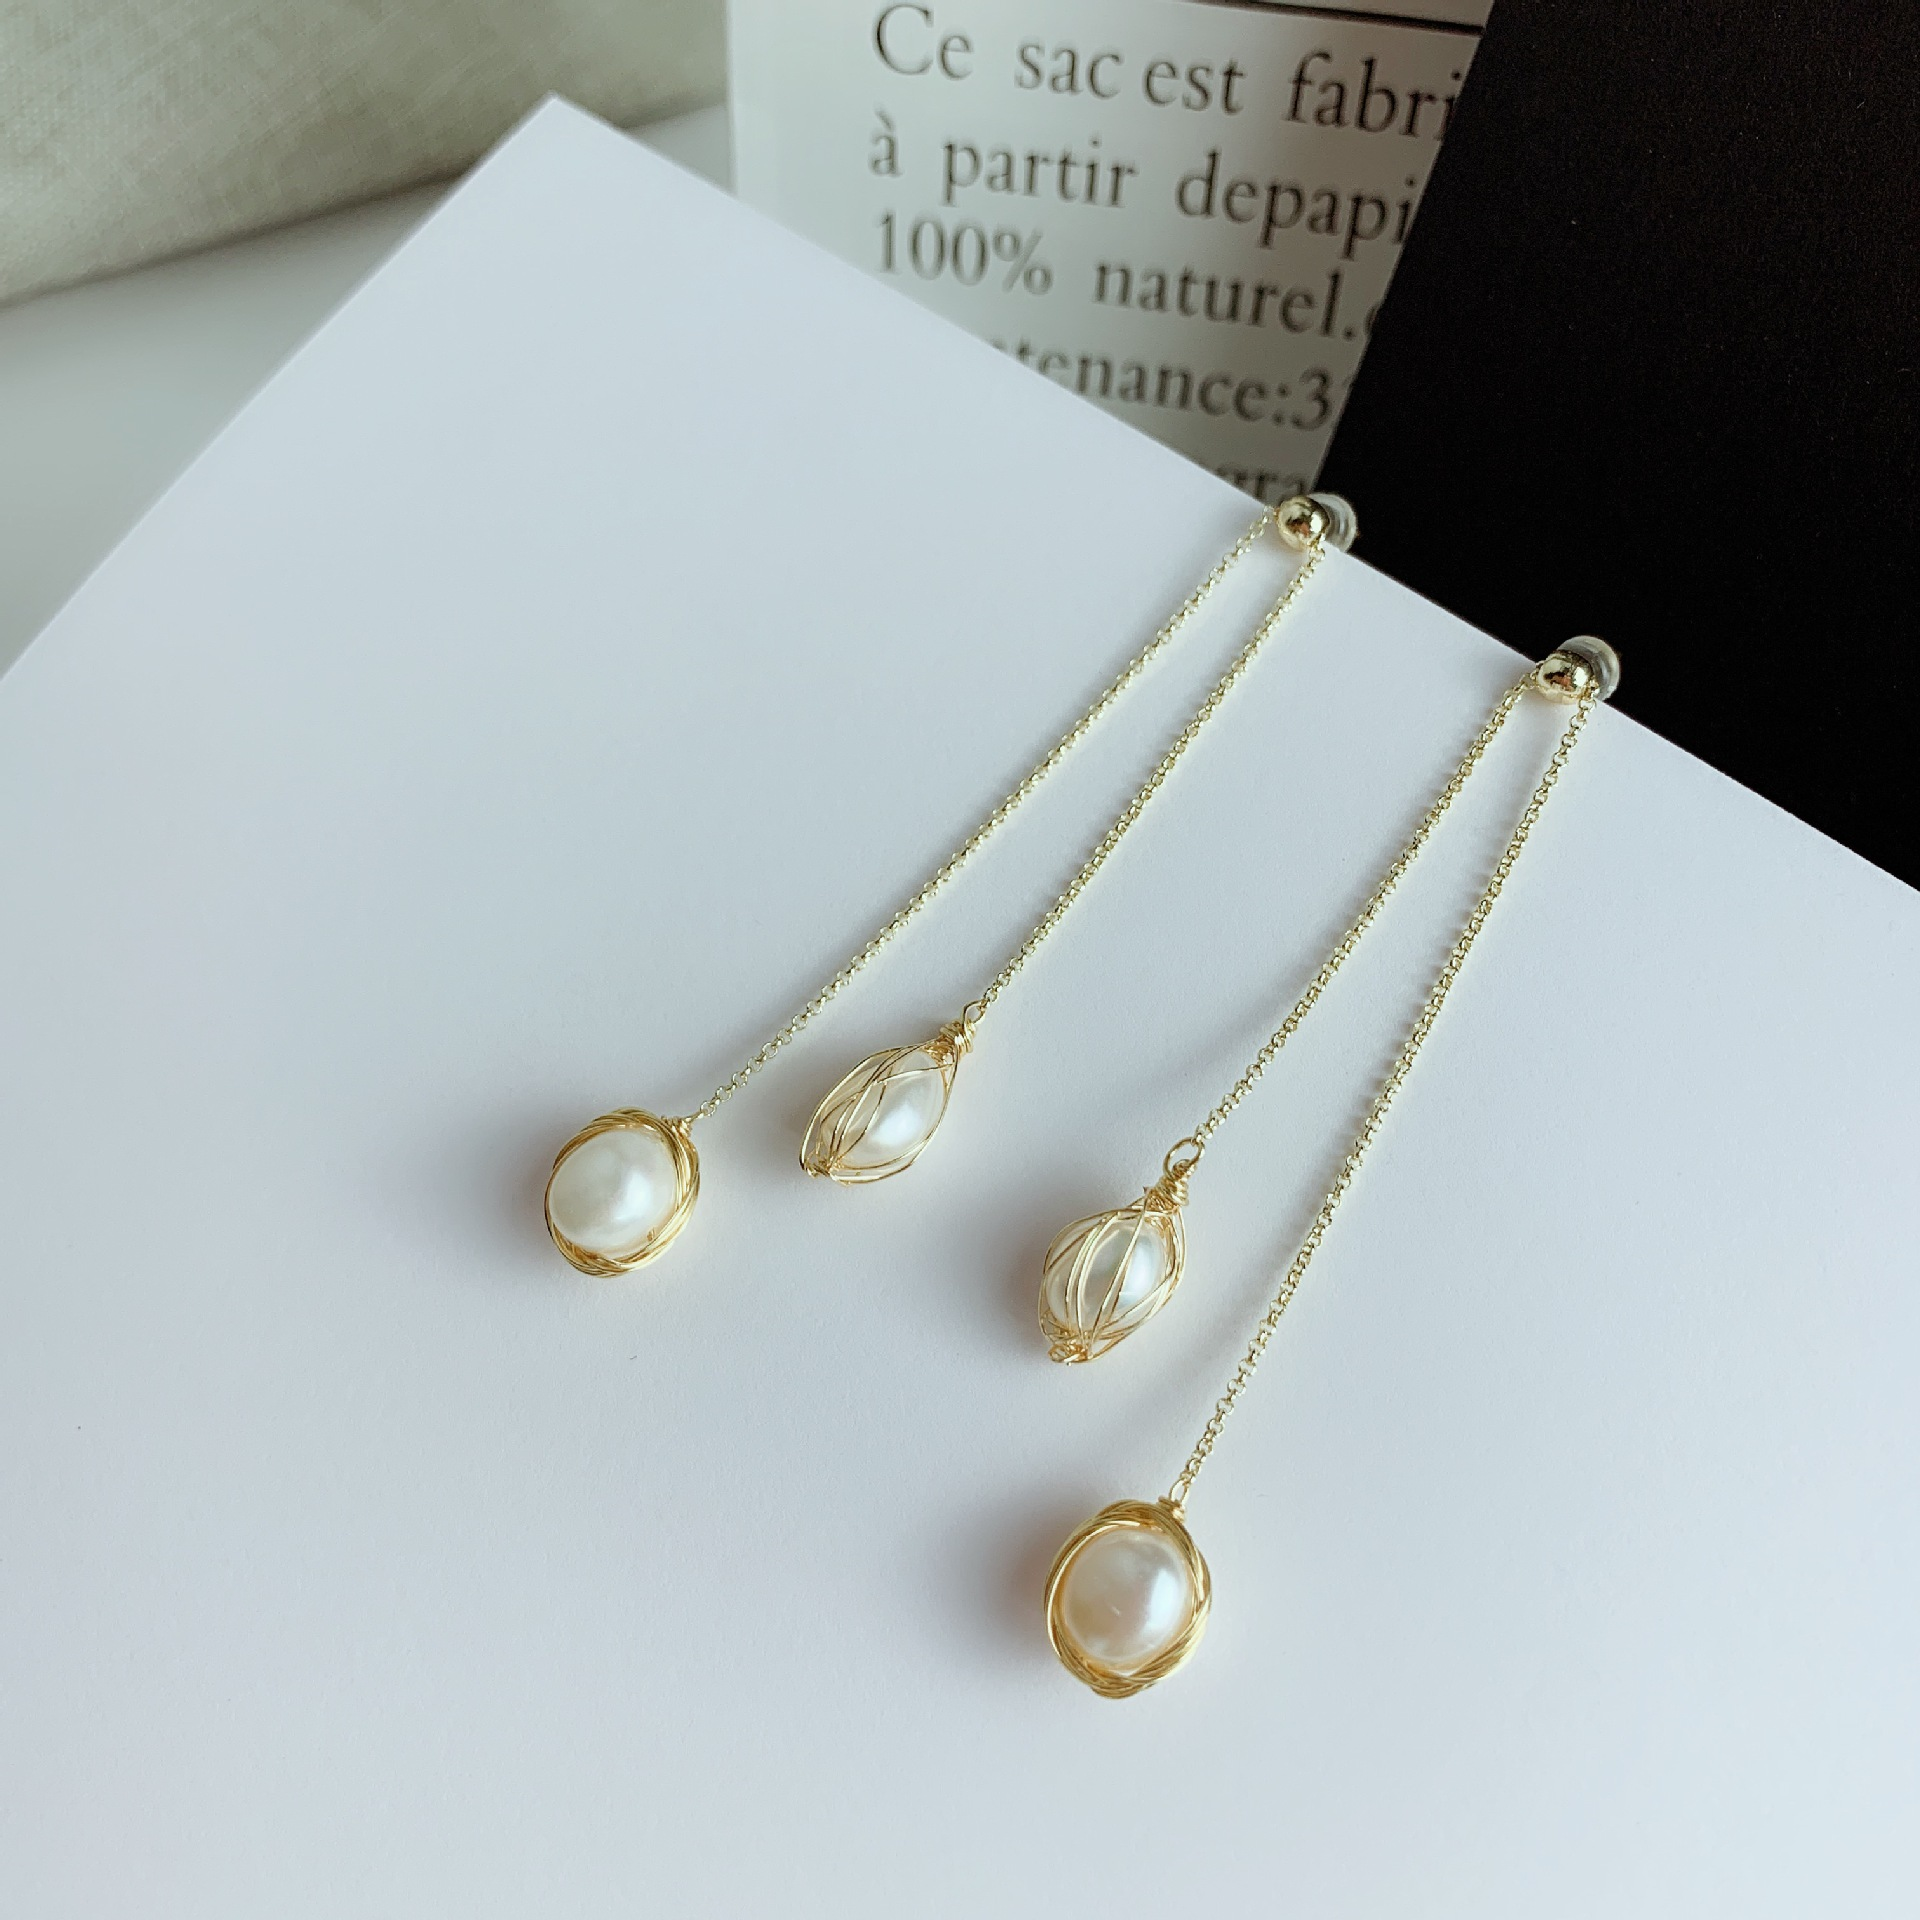 2019 Fashion Elegant Korean Long Women 39 s Natural Pearl Hanging Earrings Girl Birthday Gift Perle Baroque Earrings Aretes EC01682 in Drop Earrings from Jewelry amp Accessories